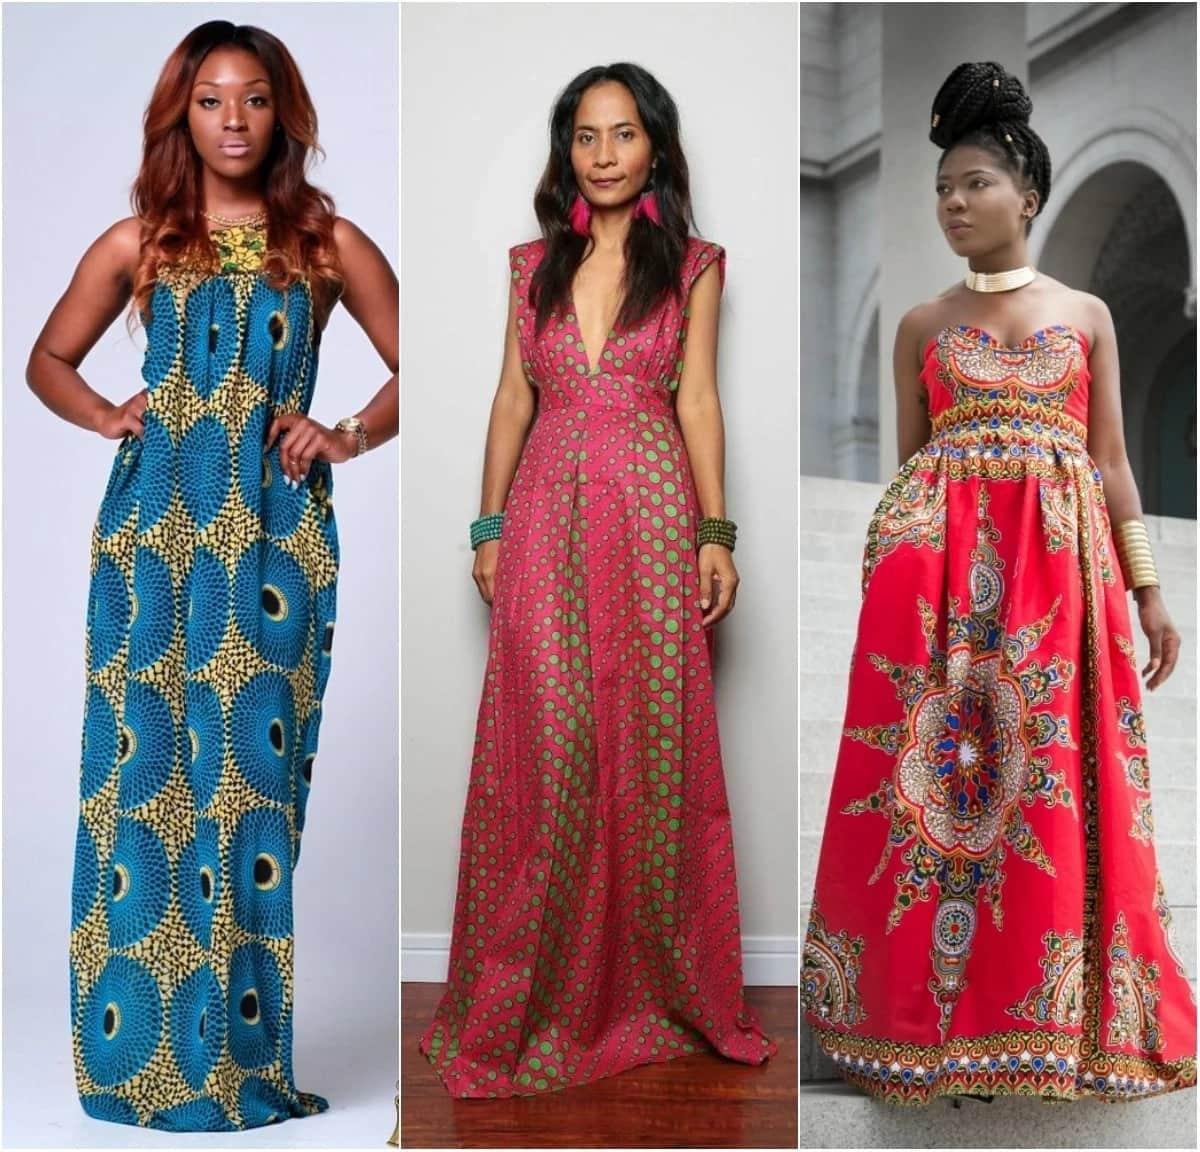 african print maxi dresses,african print dresses 2018, african print dresses styles